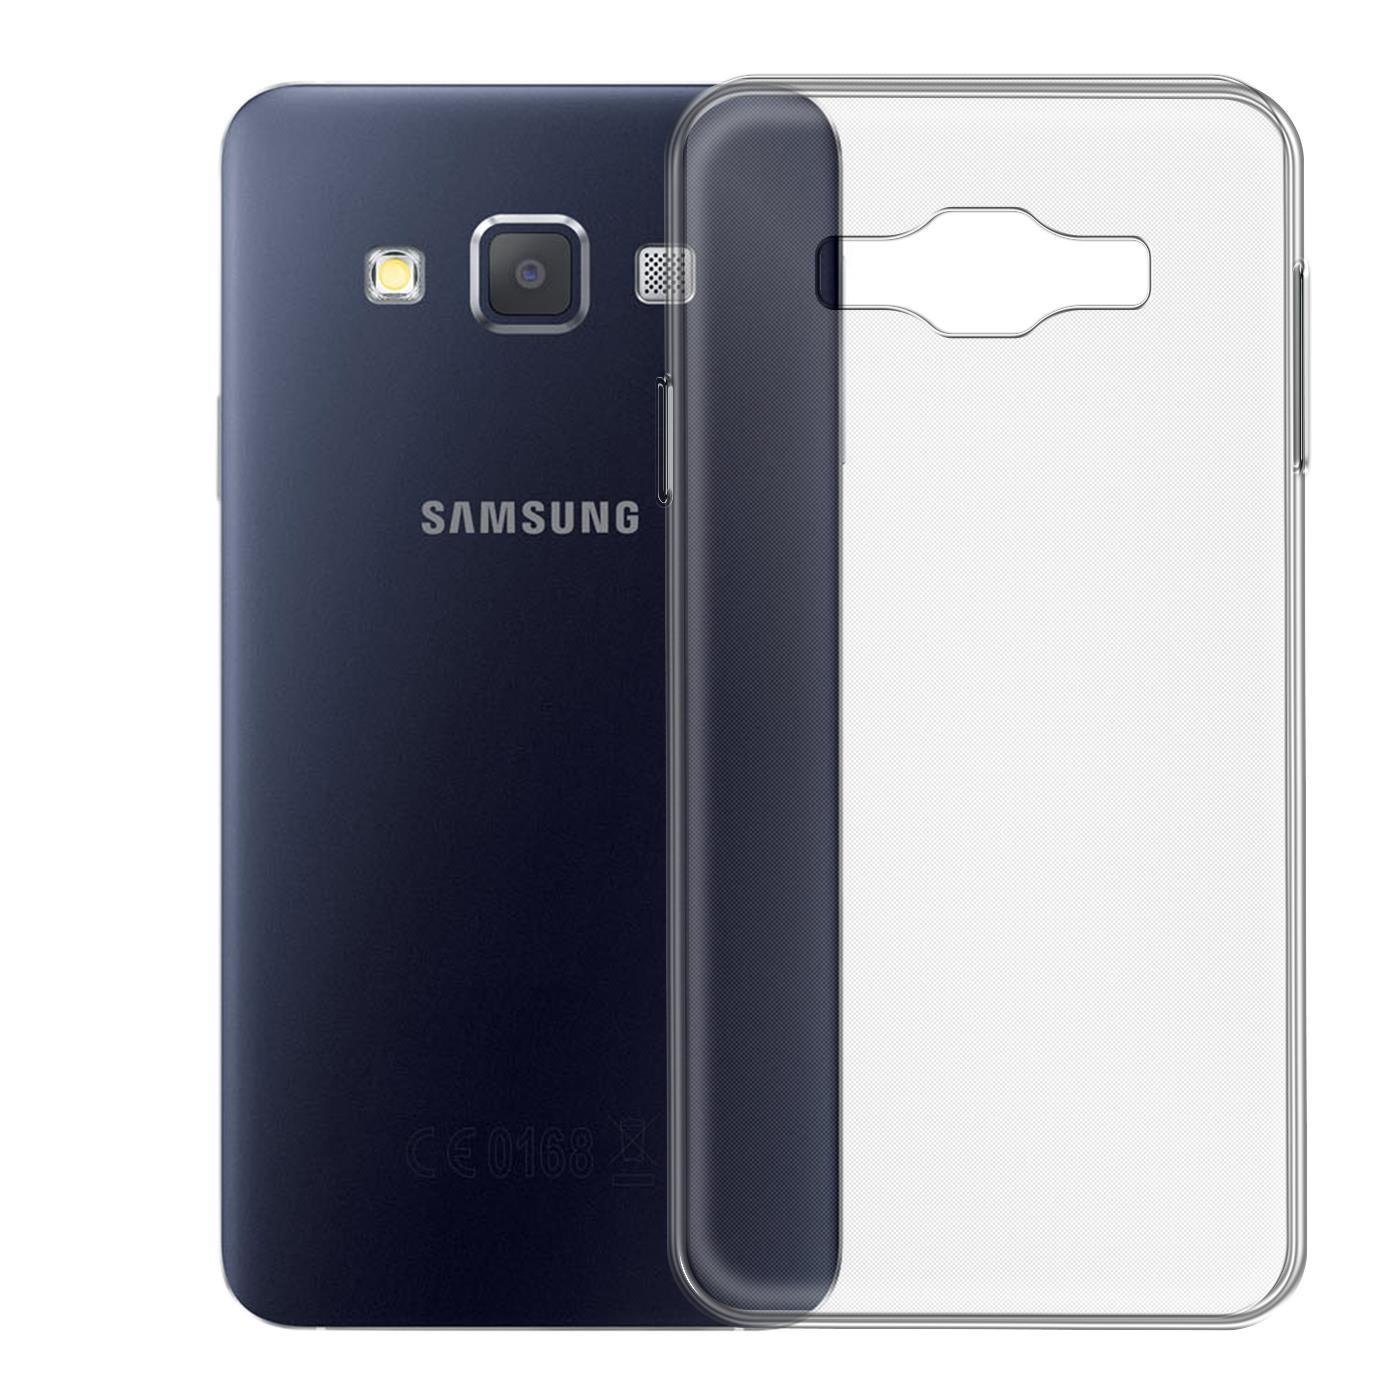 Samsung-Galaxy-A3-2015-Thin-Silicone-Clear-Case-Cover-Ultra-Slim-Shockproof-Gel Indexbild 30